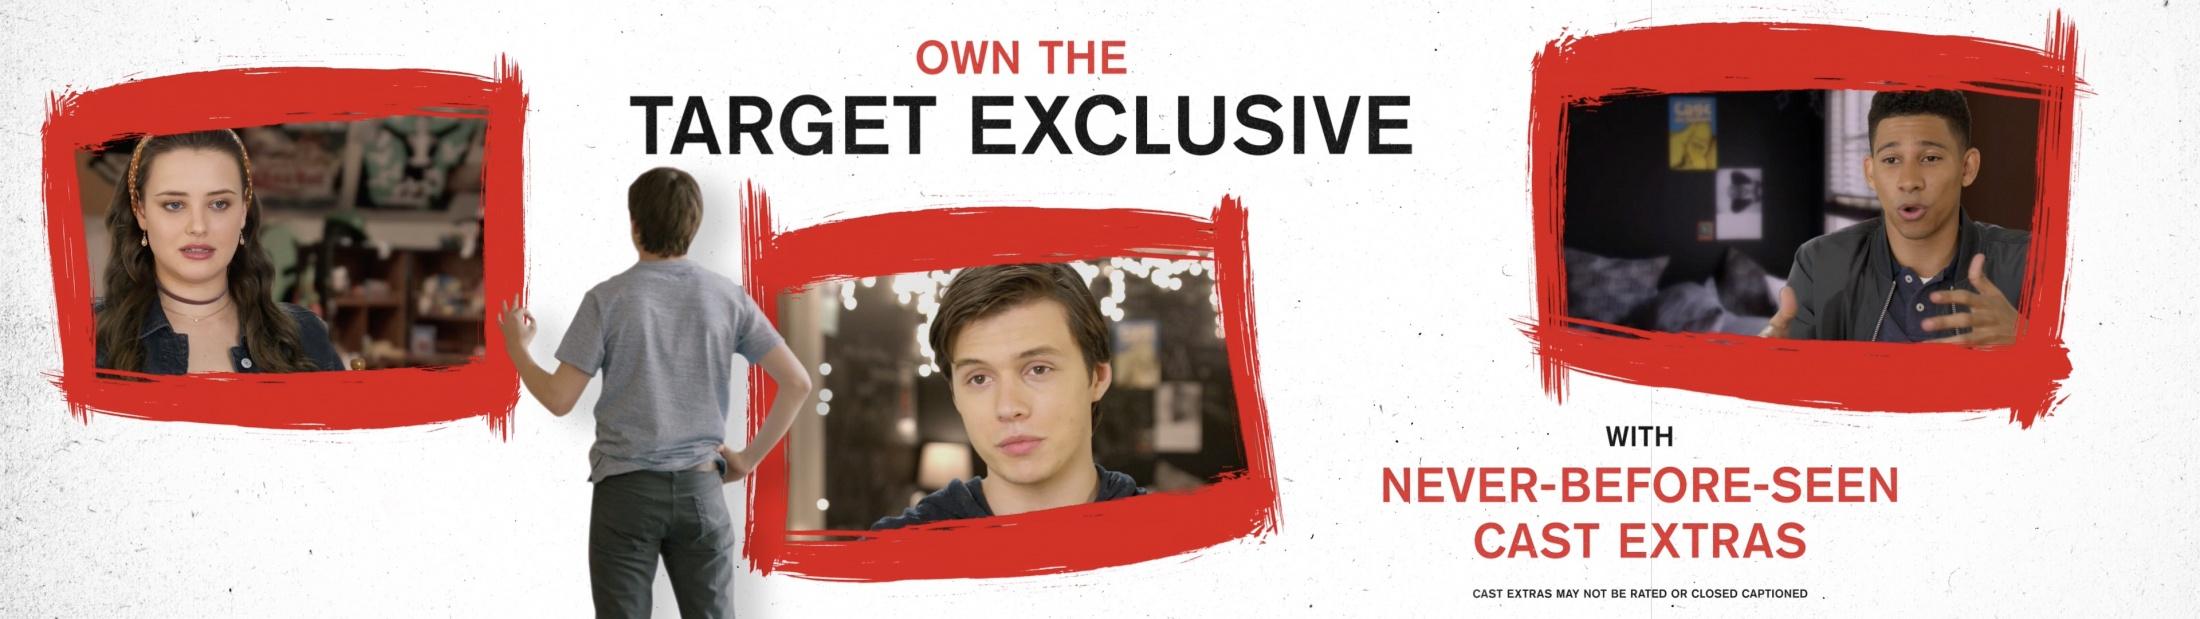 Thumbnail for Target Showcase Wall